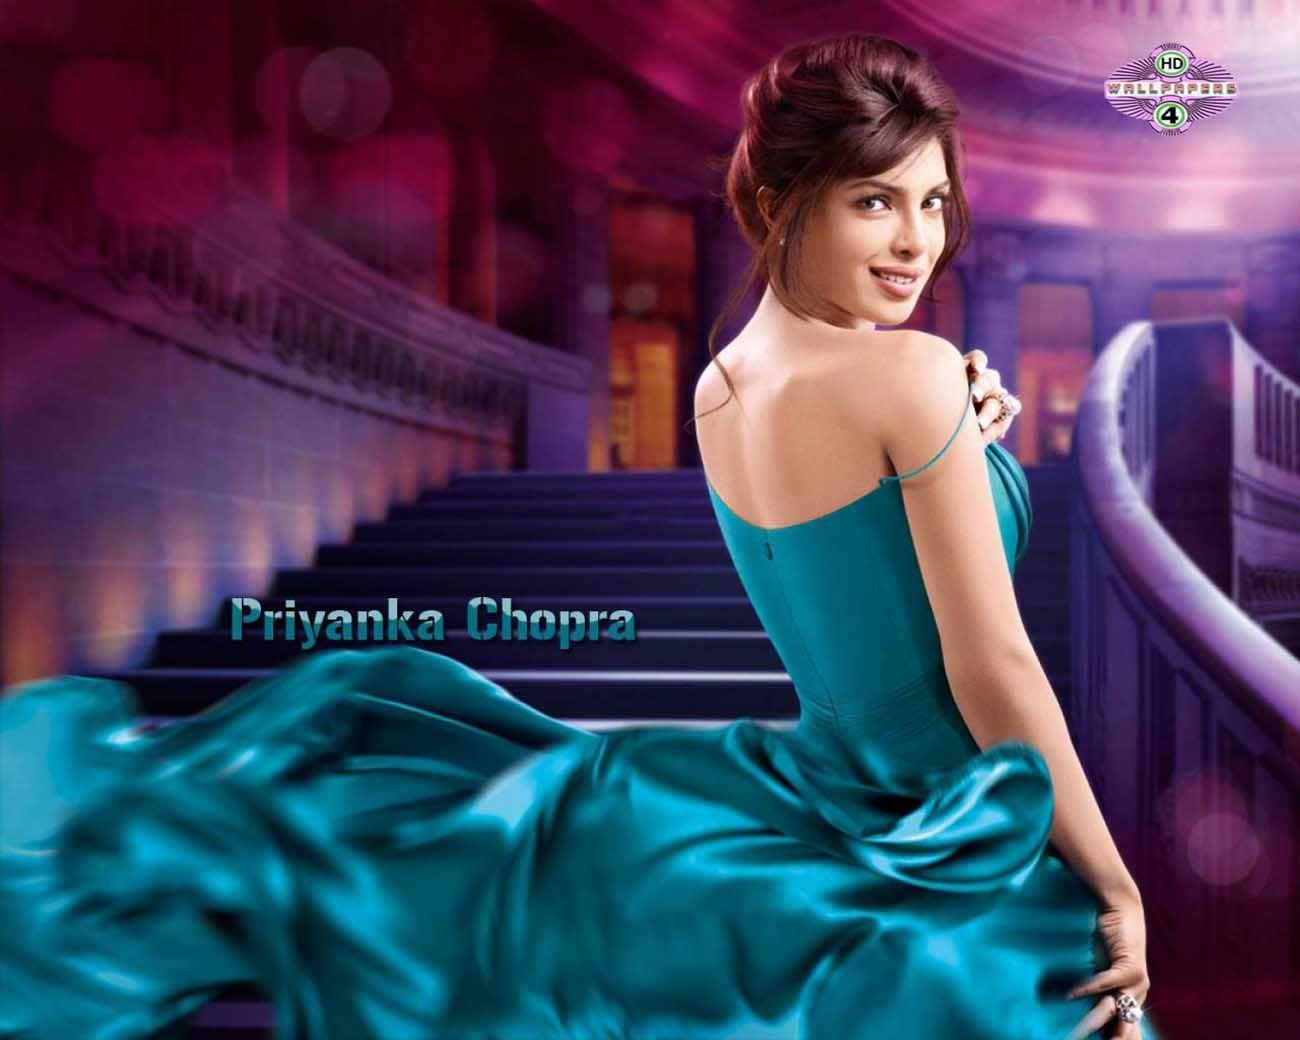 priyanka chopra hd wallpaper, priyanka chopra image, priyanka chopra